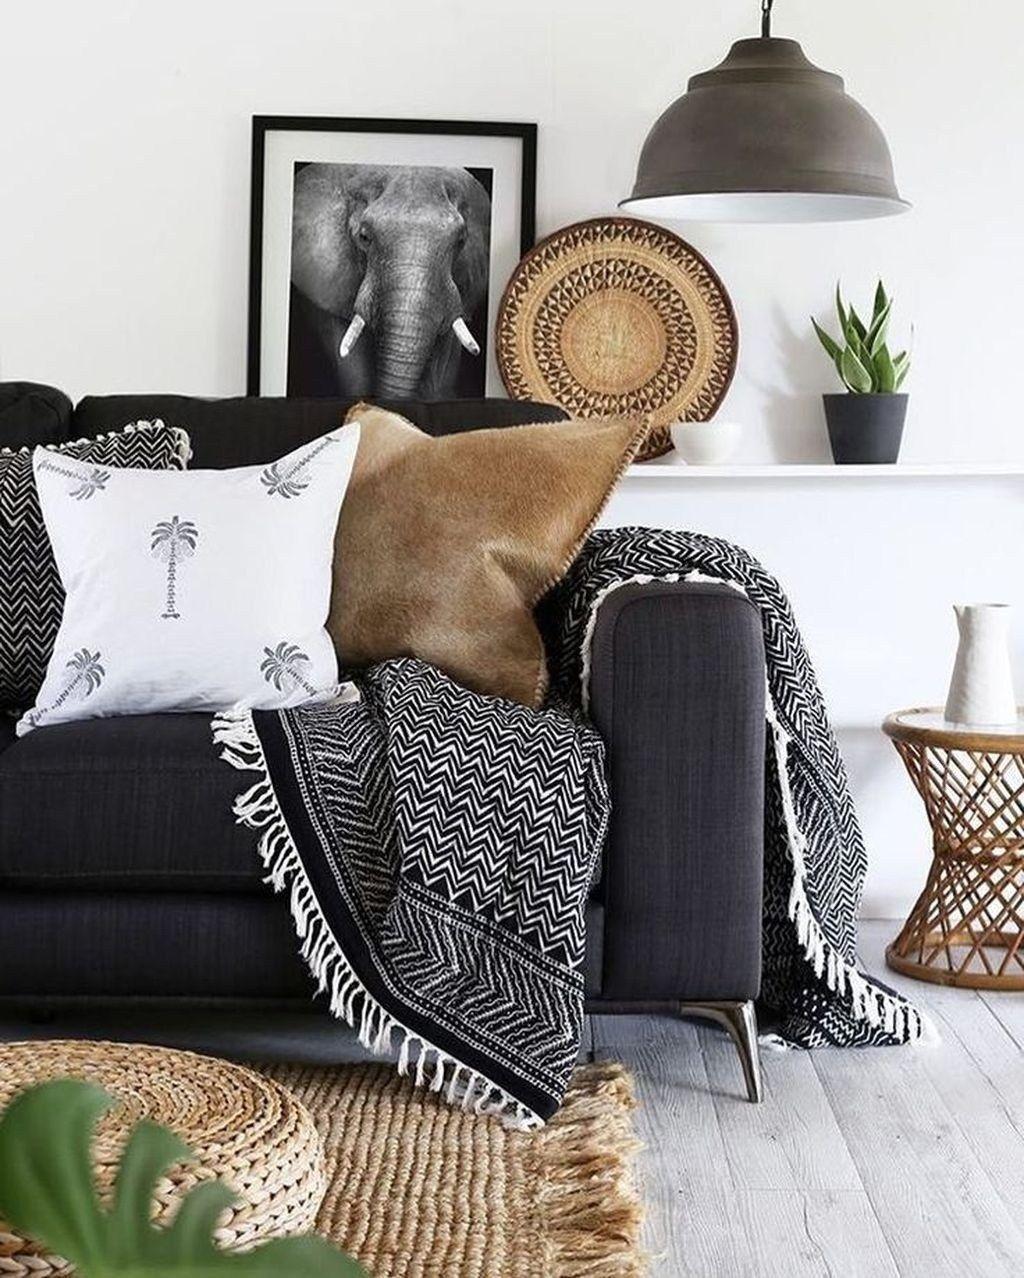 43 Elegant Bohemian Style Living Room Decoration Ideas 43 Elegant Bohemian Style Living Room Decoration Ideas living